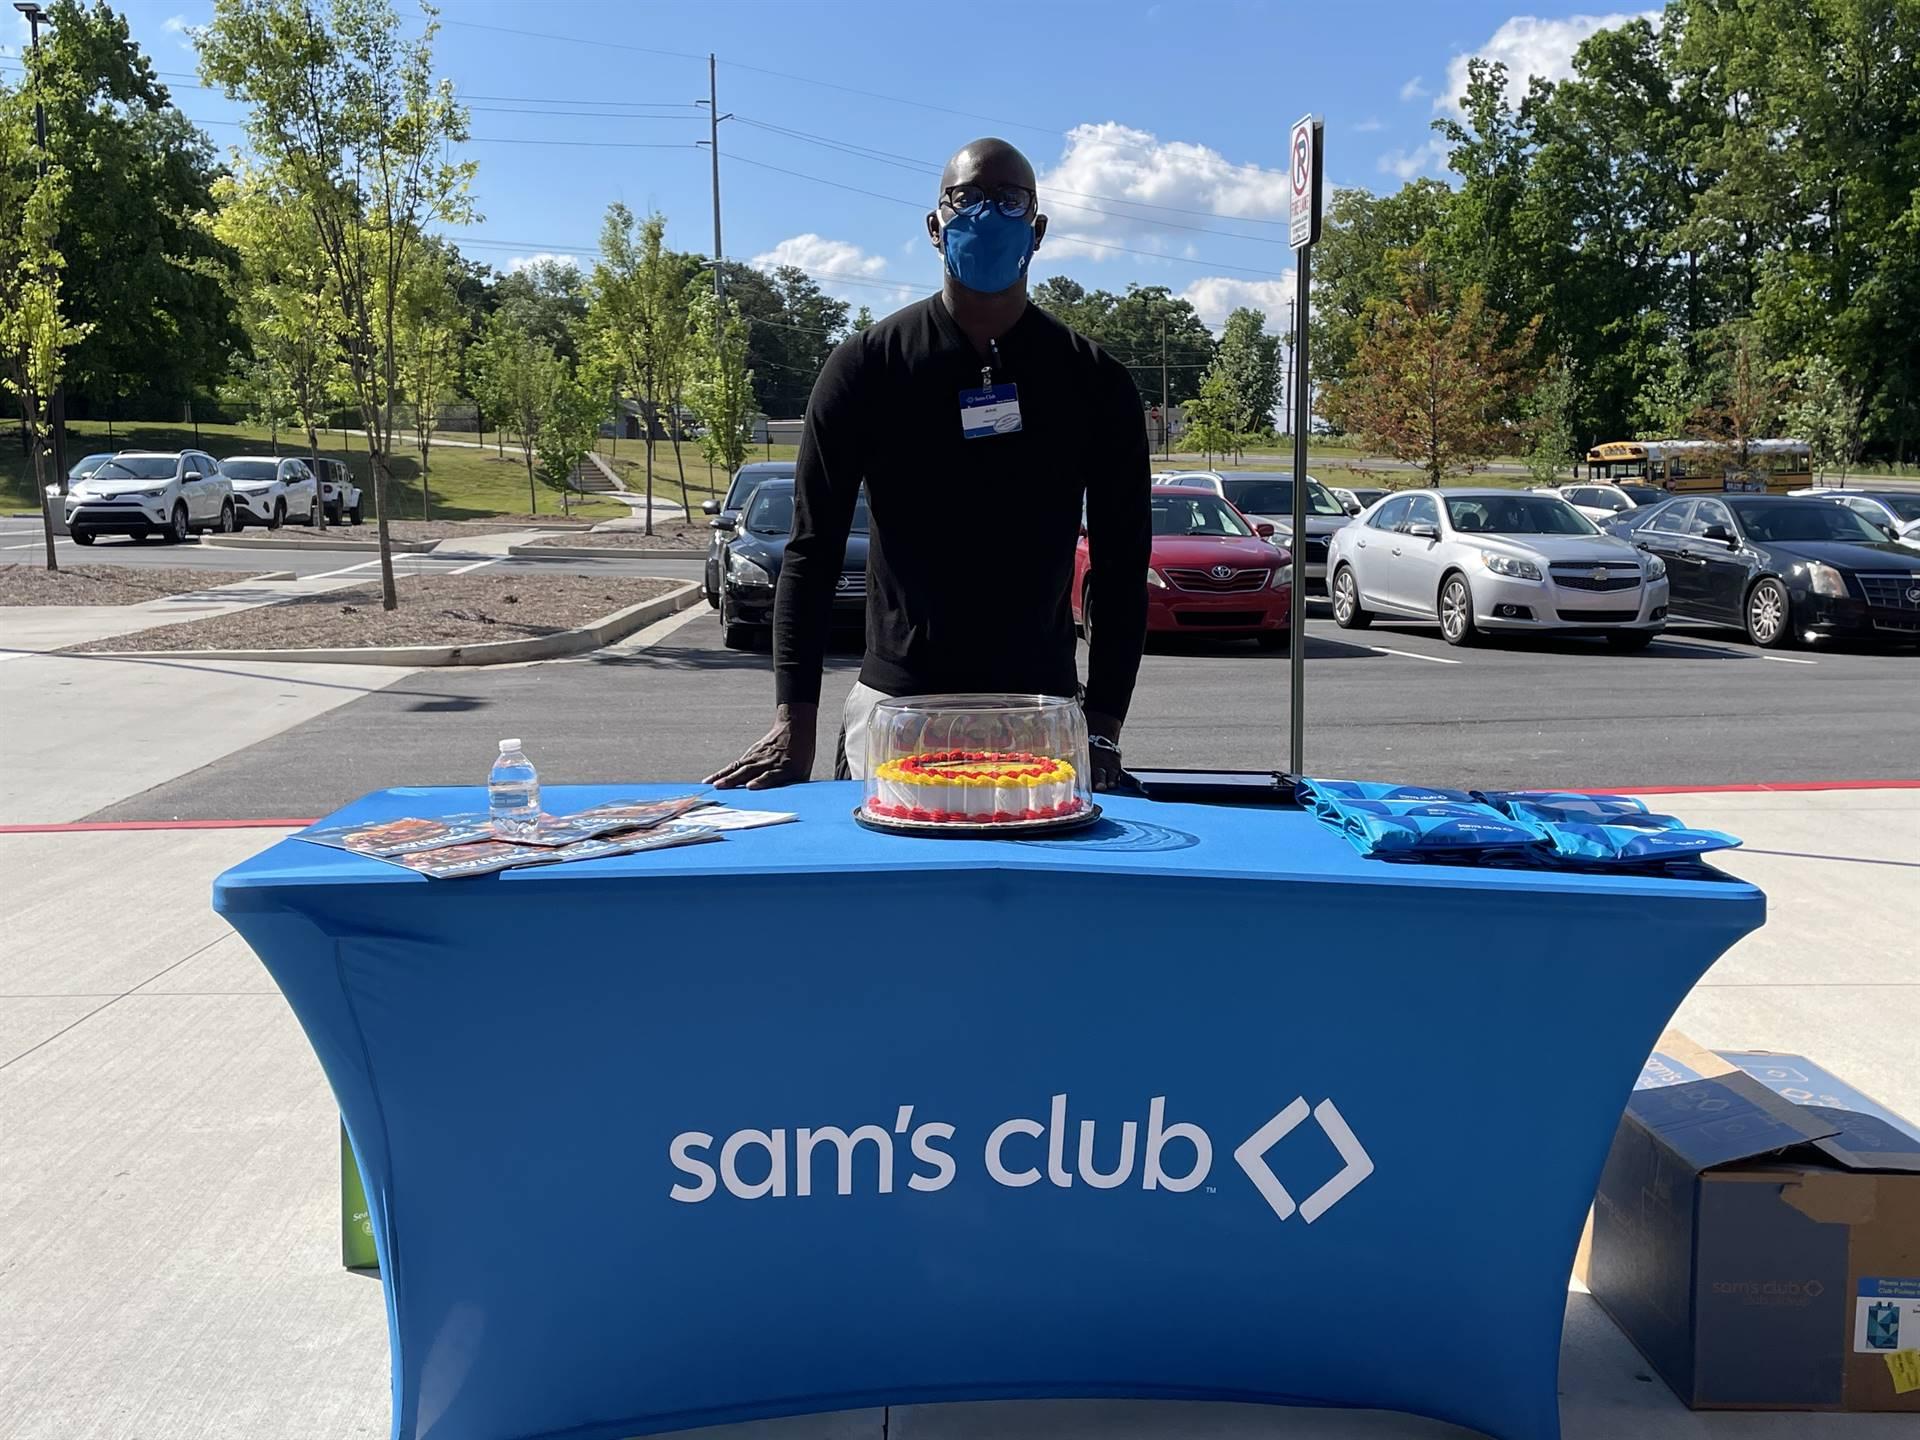 Sam's Club representative